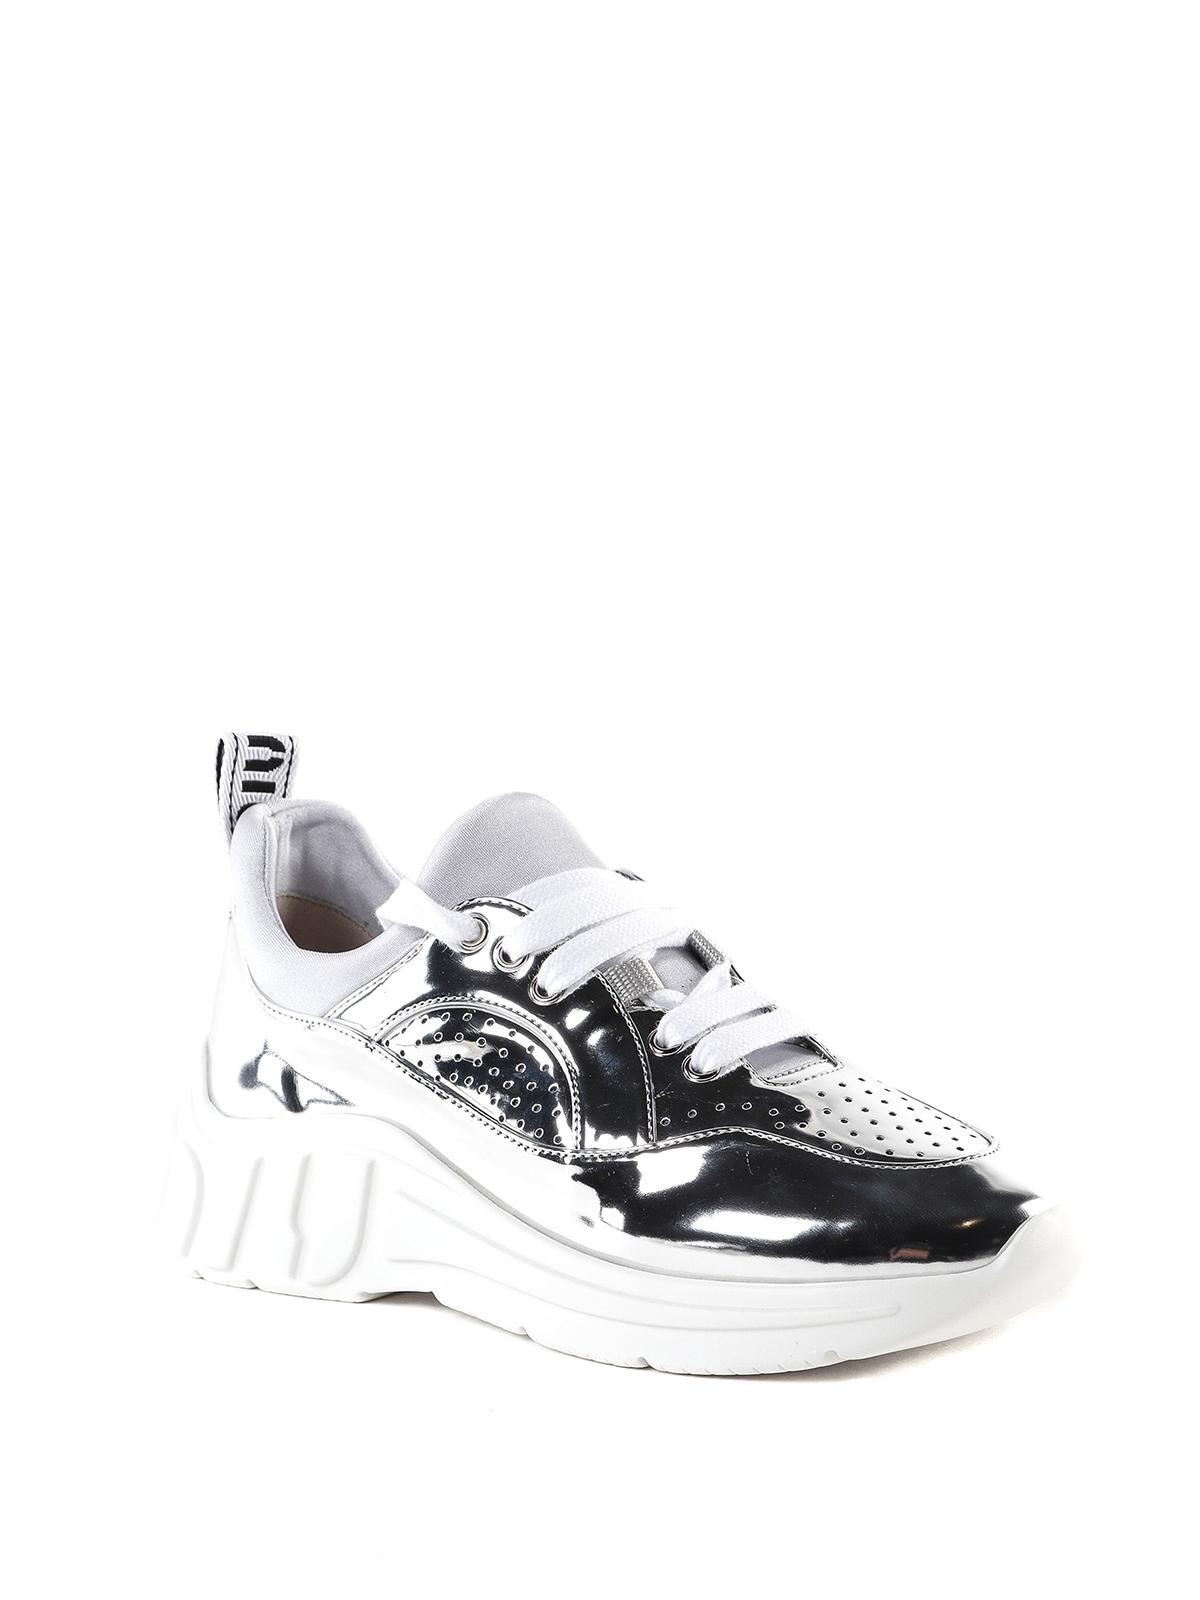 Miu Miu - Miu Run metal tech sneakers